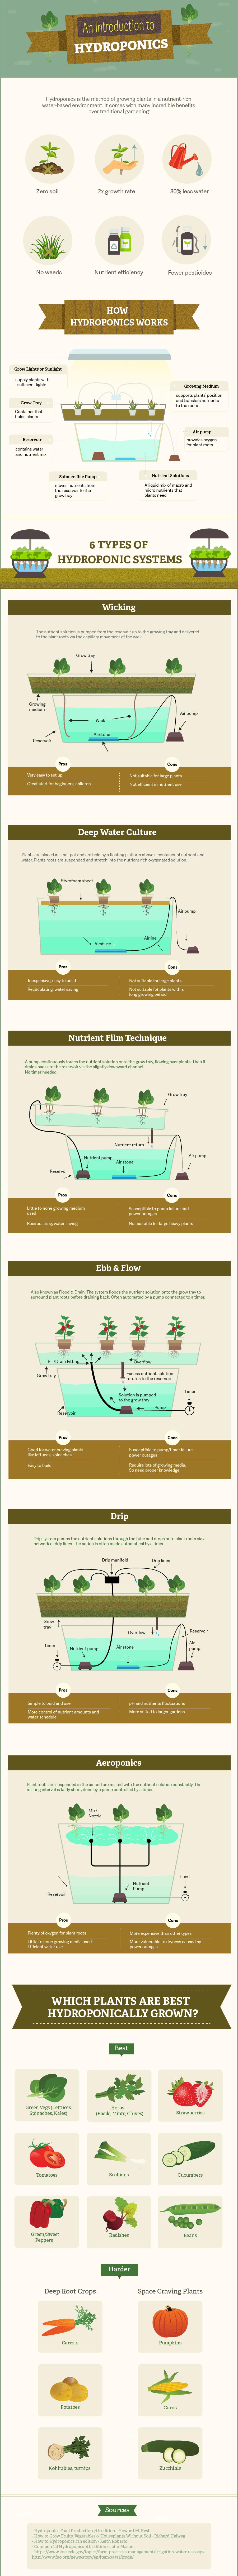 hydroponic gardening infographic